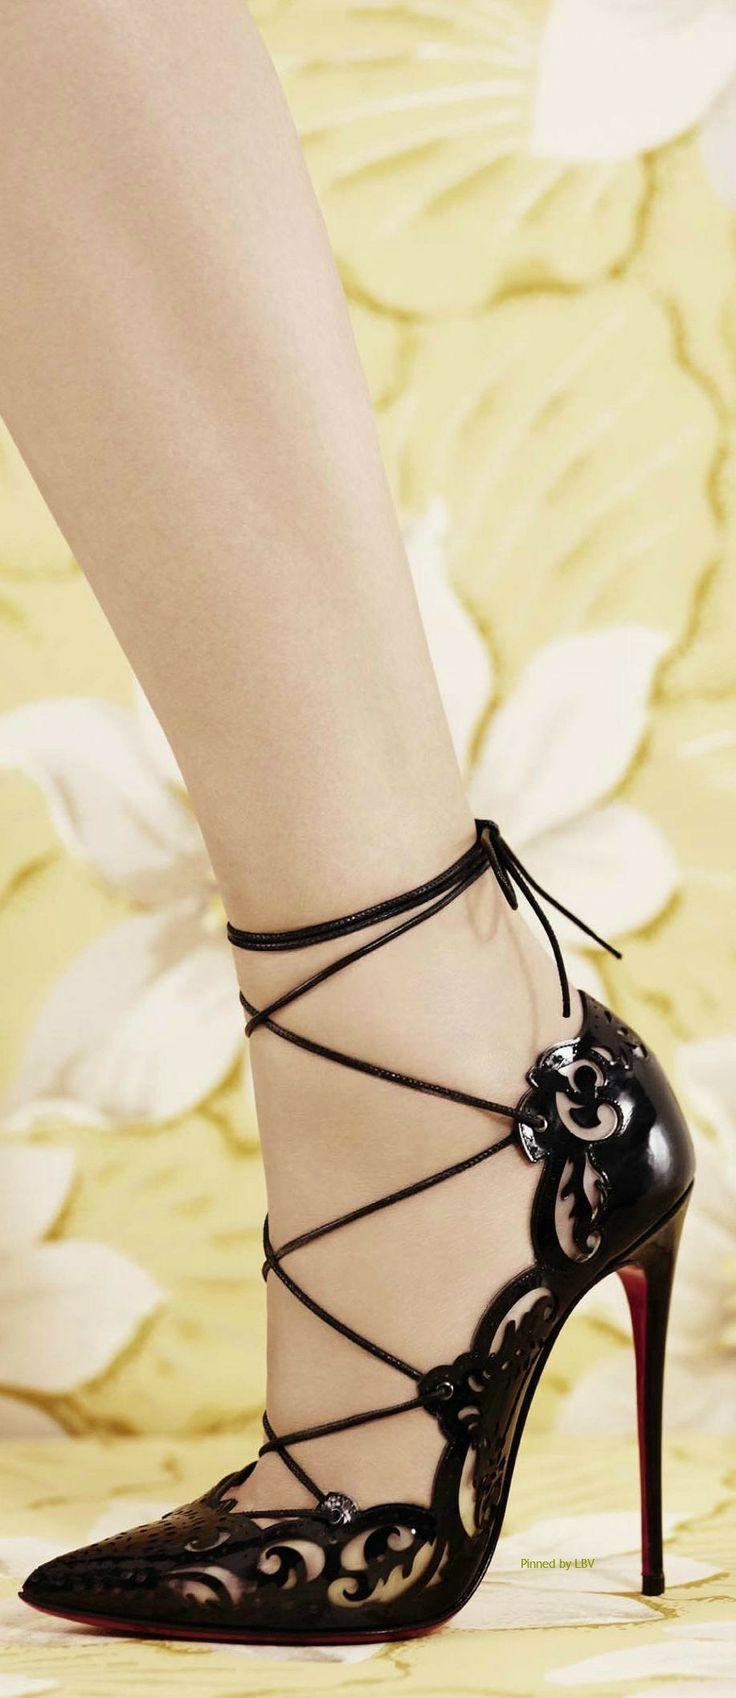 Black sandals louboutin - Christian Louboutin Black Lace Up Sandal Spring 2014 Style Estate